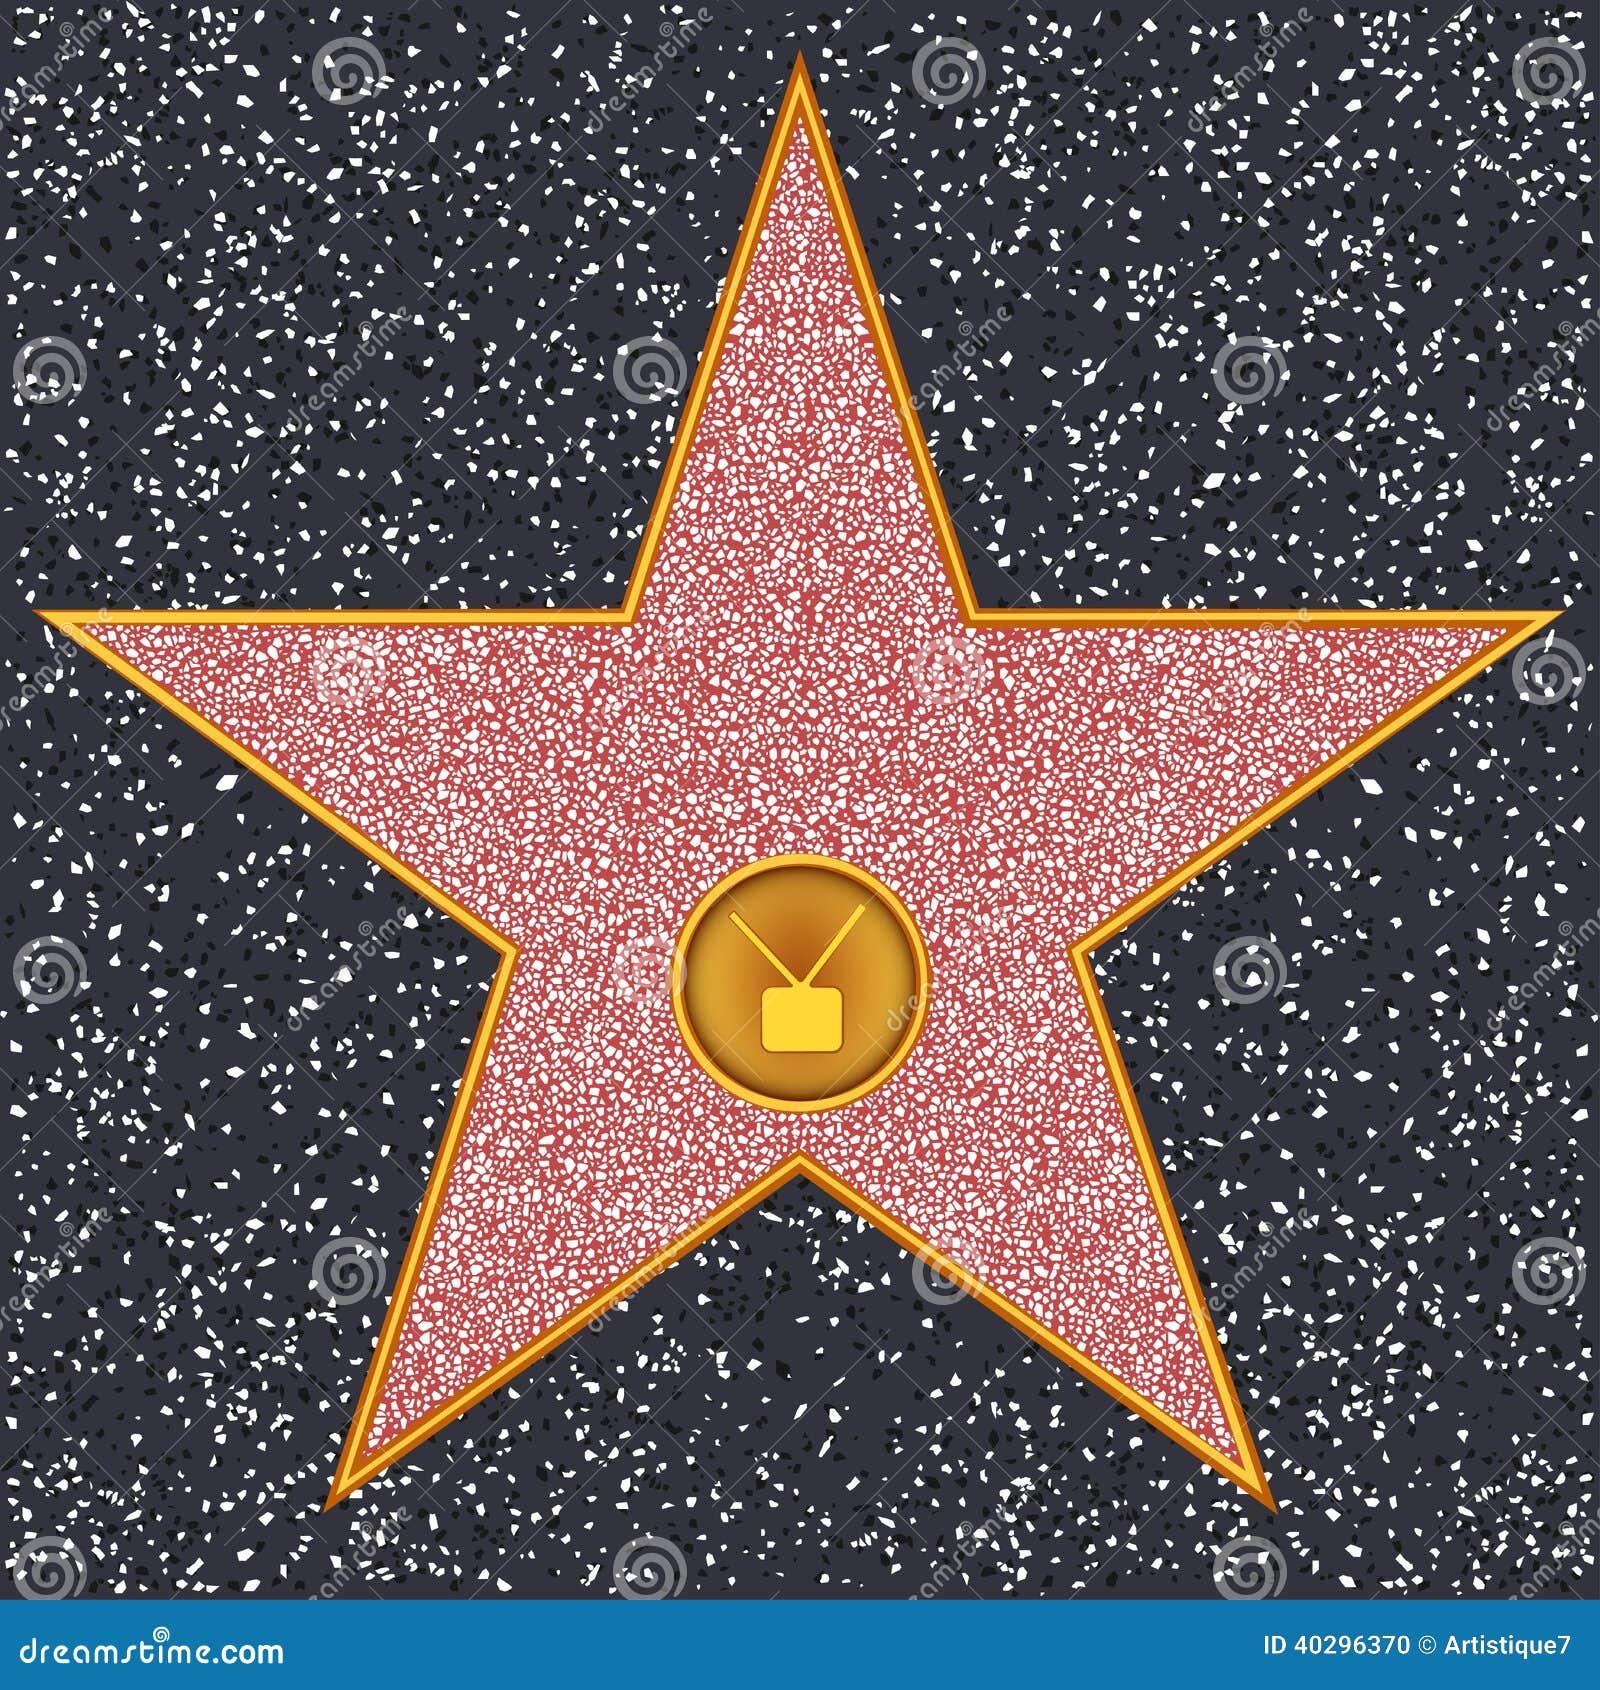 SternTVGerät (HollywoodWeg Des Ruhmes) Vektor Abbildung